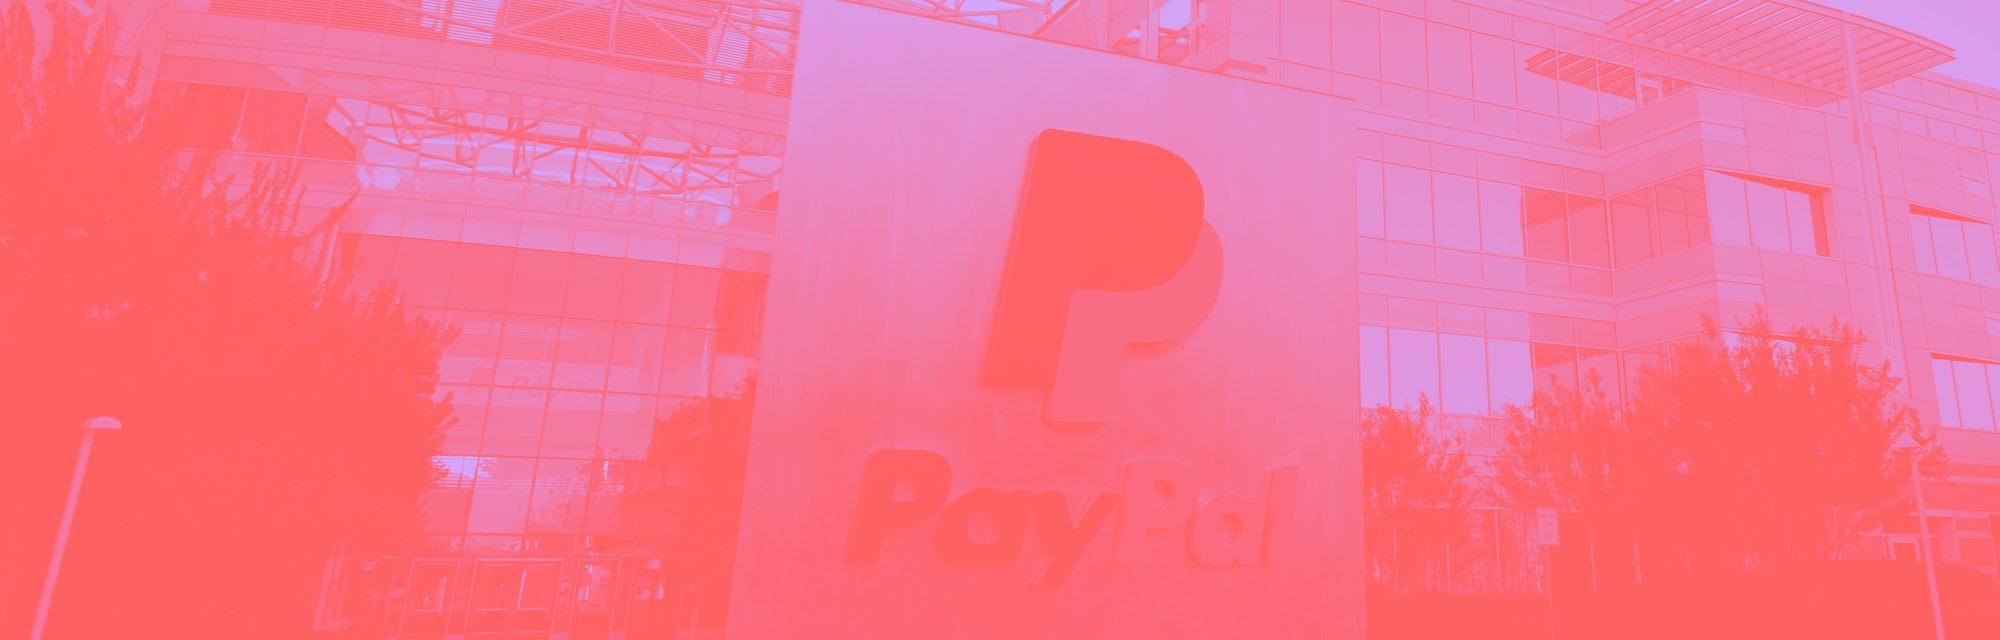 PayPal logo outside its company headquarters.